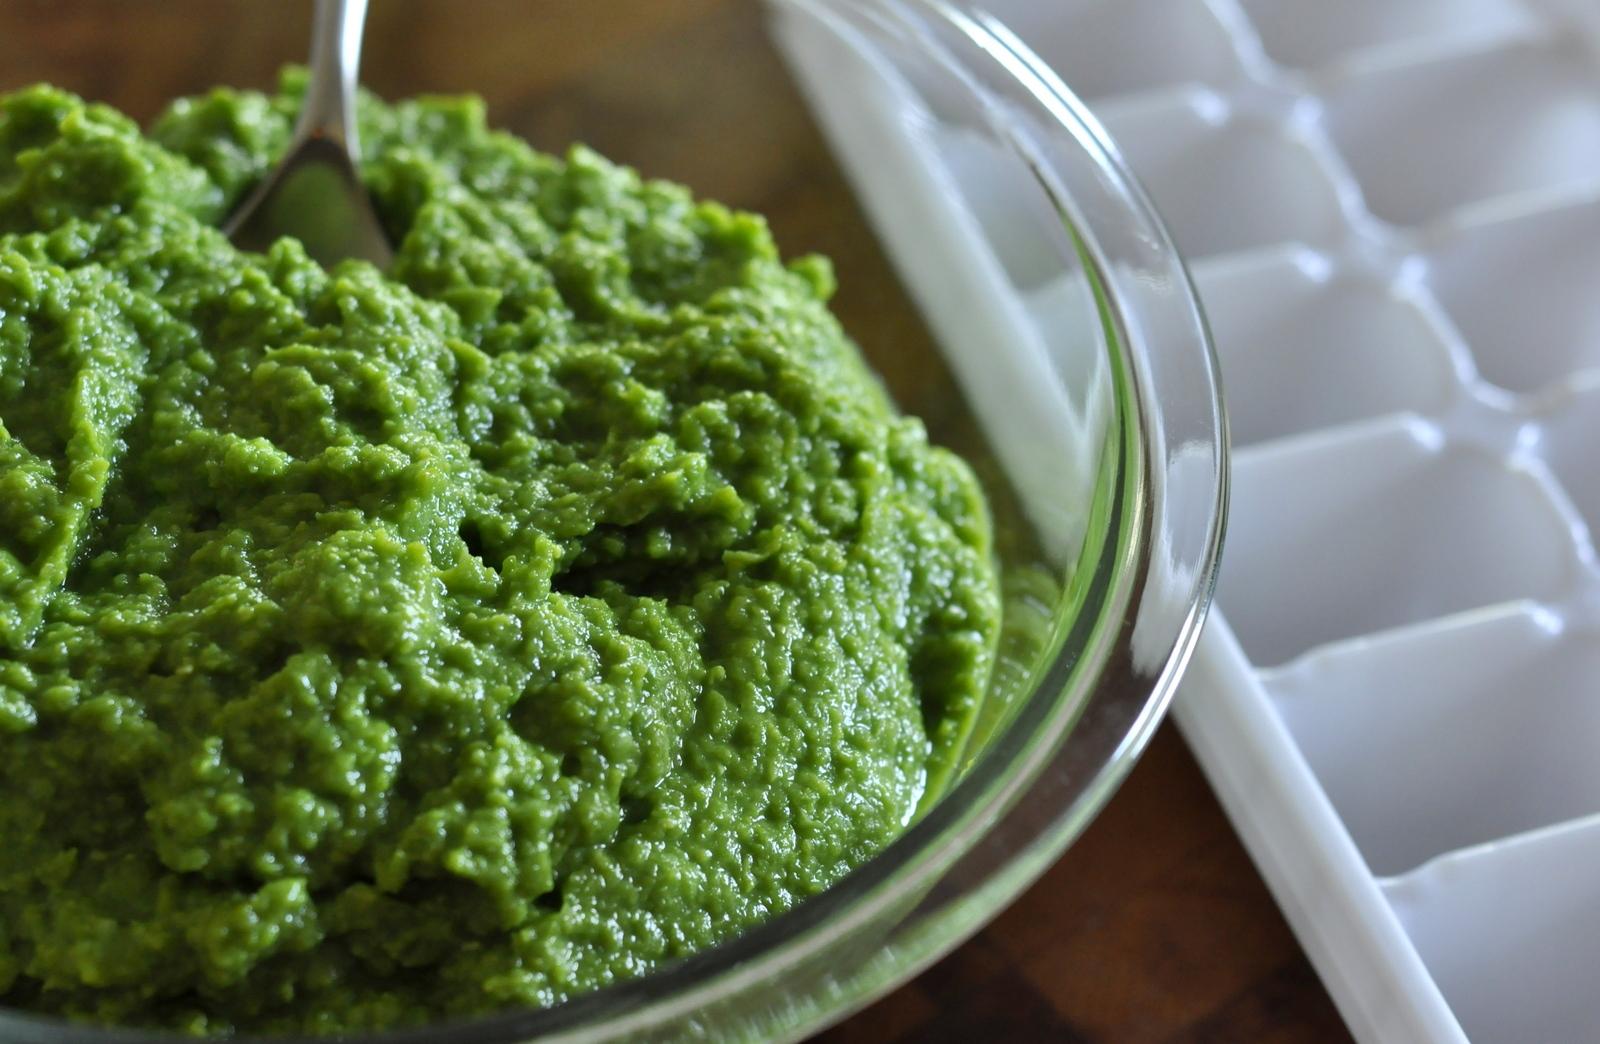 How-To-Make-Freeze-Homemade-Baby-Food-Pea-Puree-tasteasyougo.com